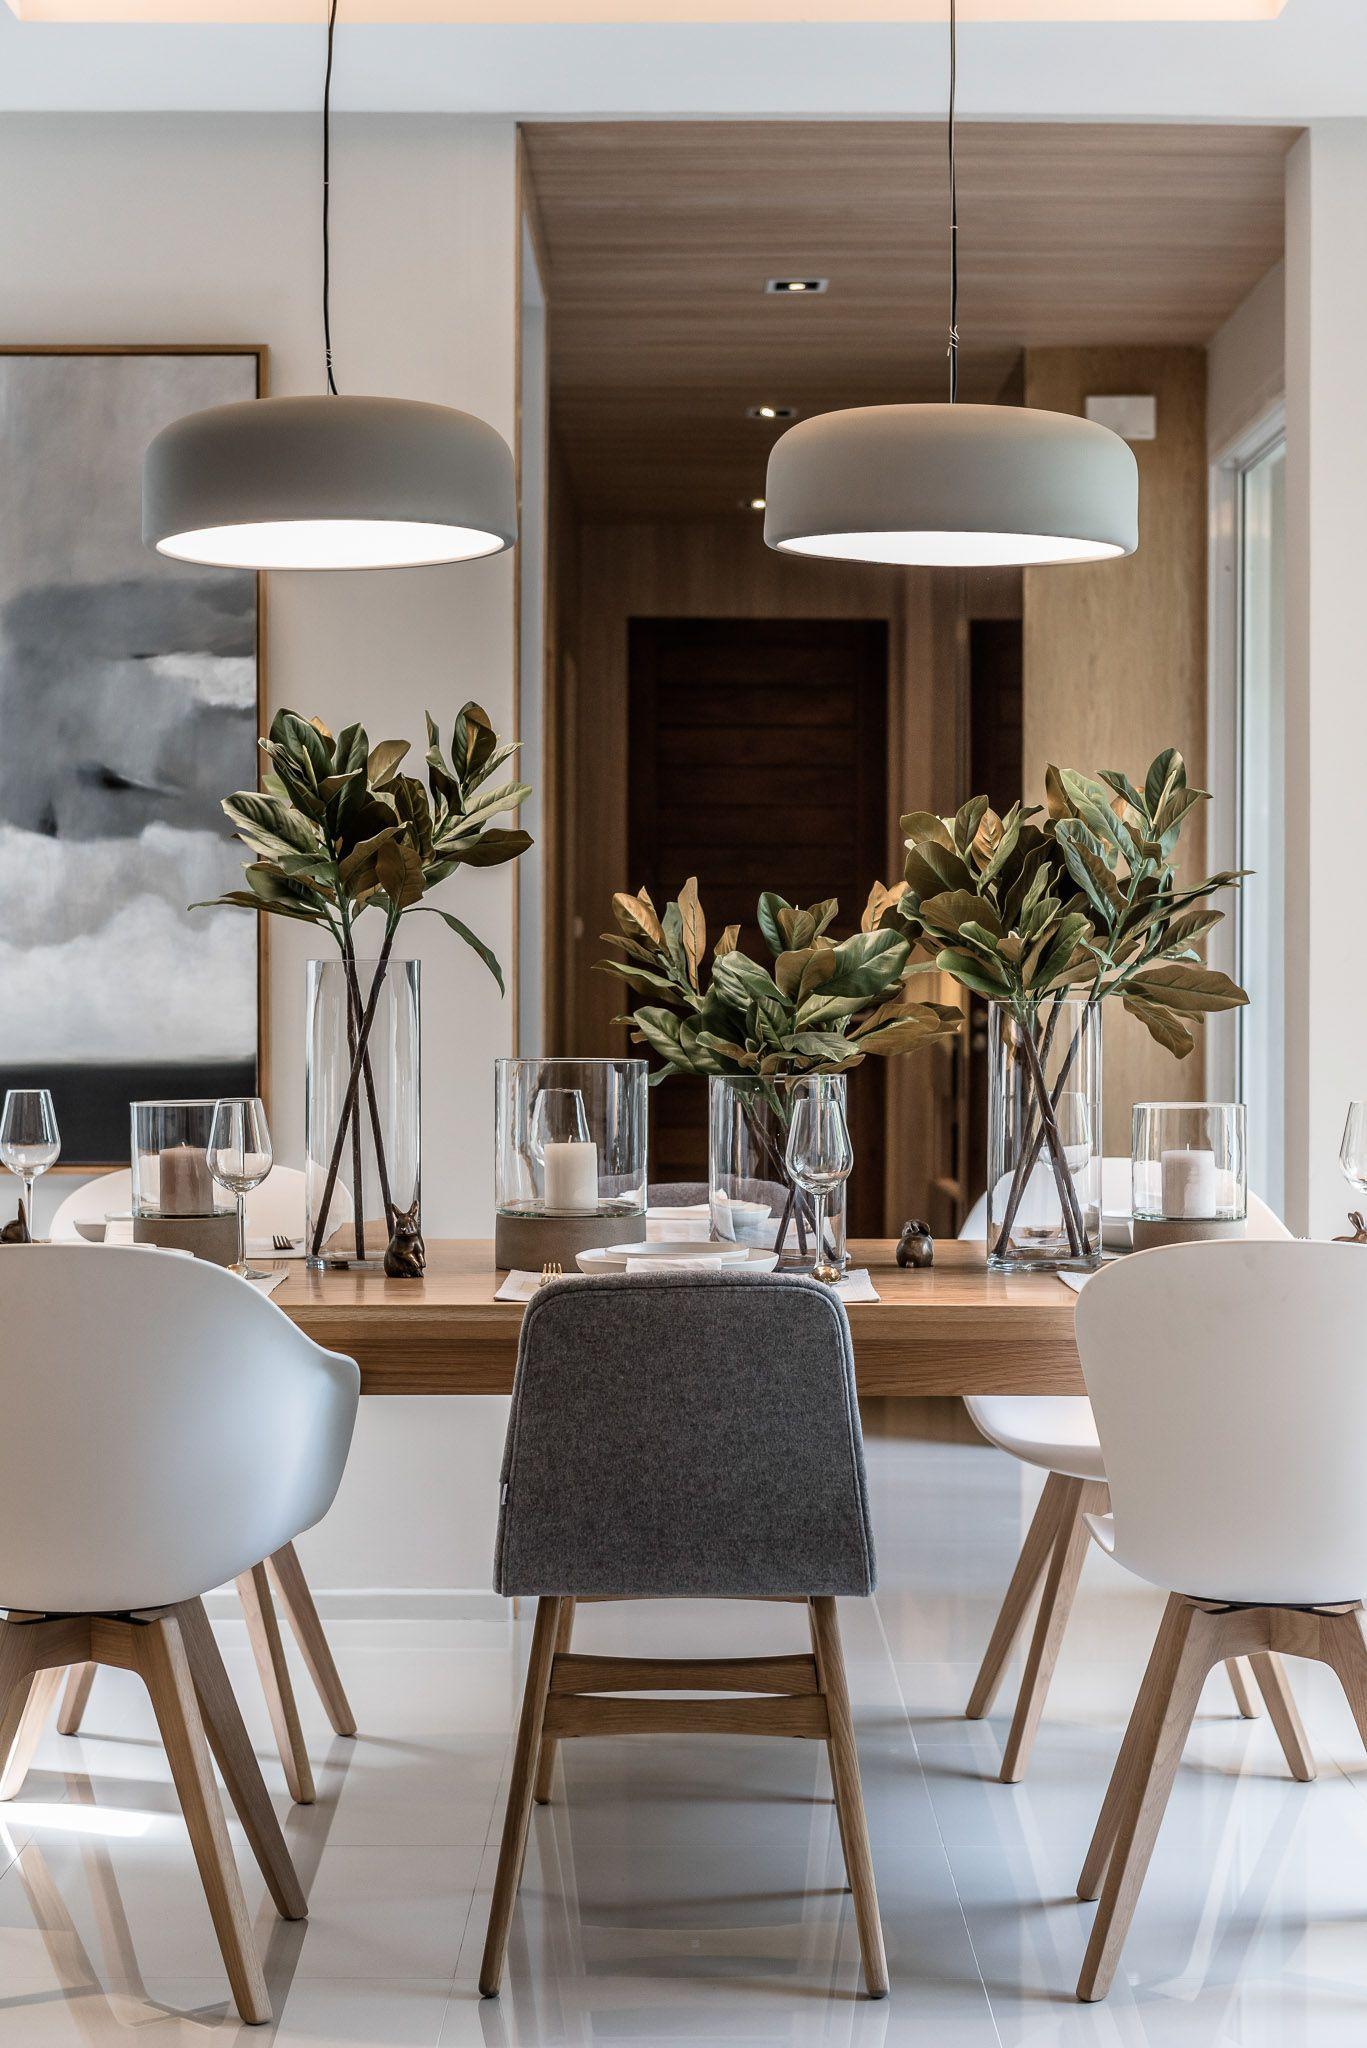 Lighting Stores Lighting Designs You Ll Love For Your Home Interior Design Www Lig Scandinavian Dining Room Dining Room Inspiration Living Room Scandinavian